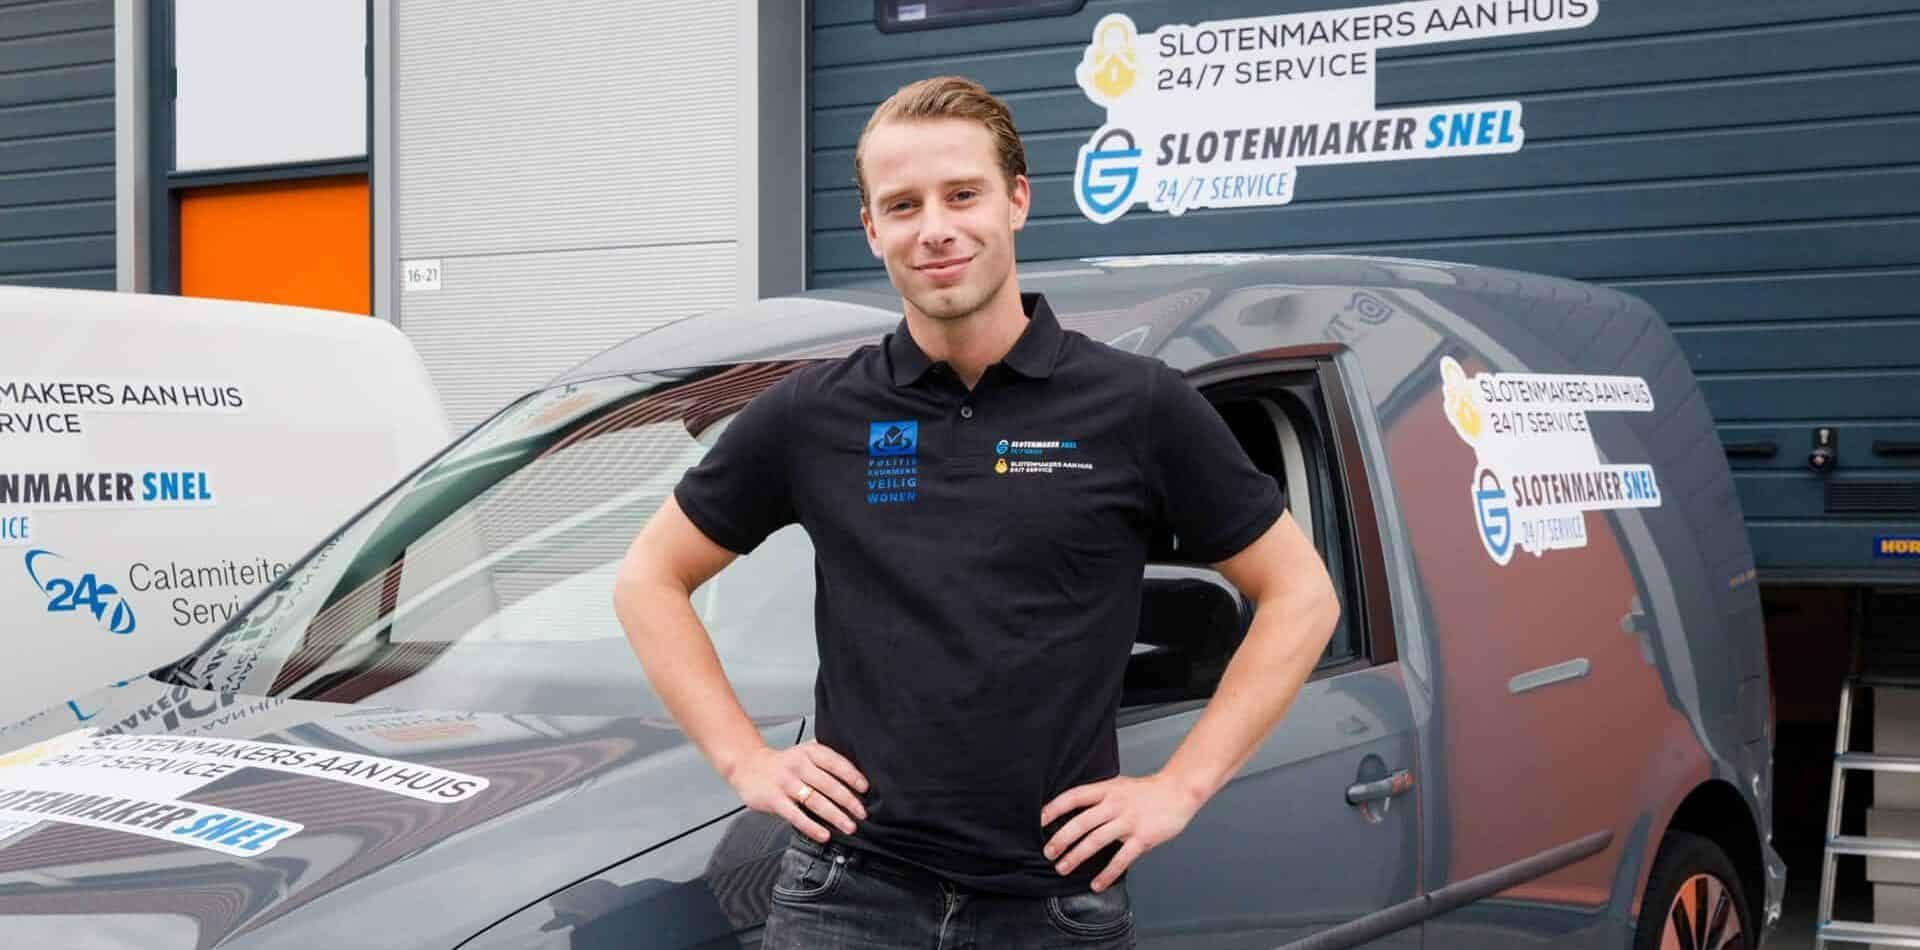 Slotenmaker Assen